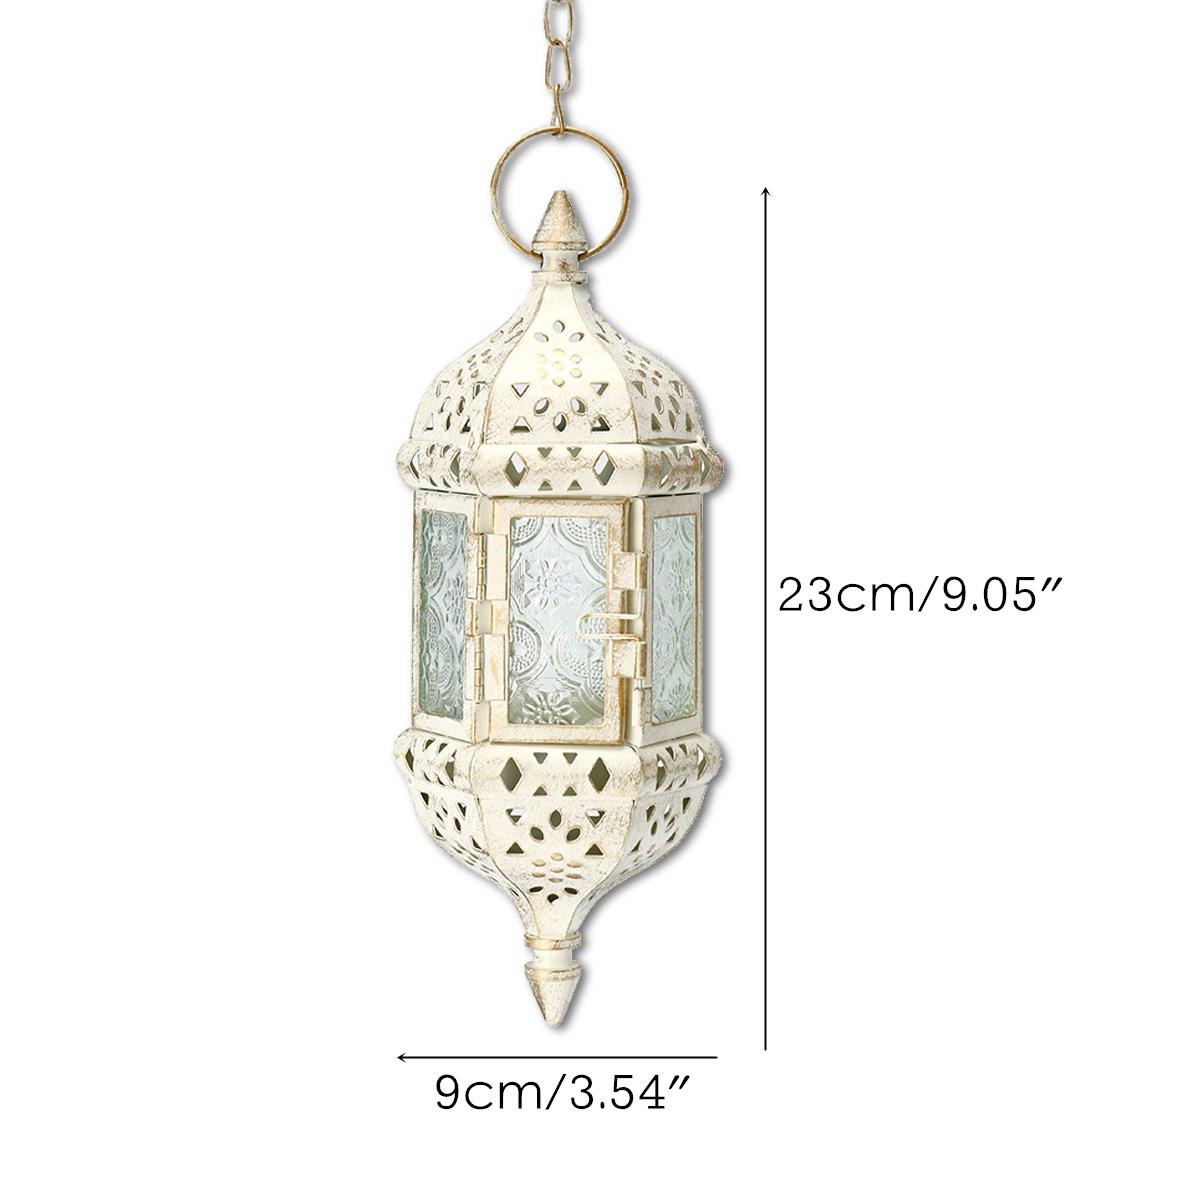 Vintage Tea Light White Candle Holder Moroccan Hanging Glass Lantern Home Decor